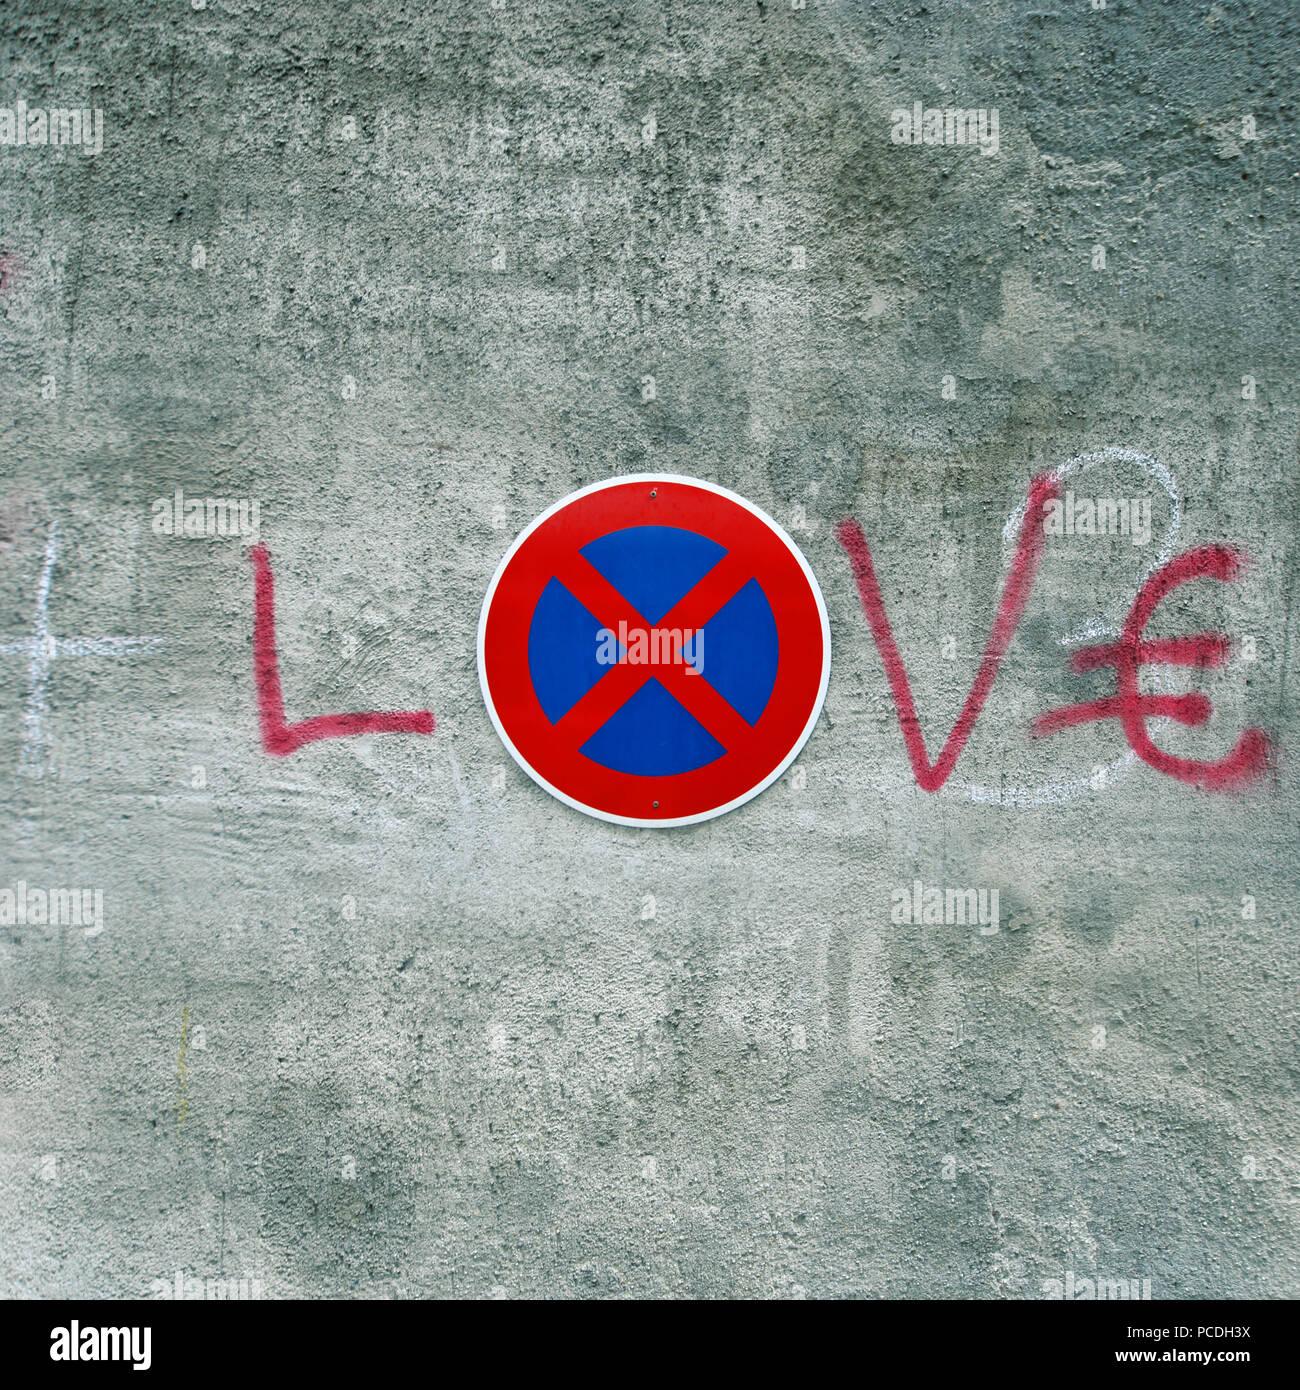 Graffiti,scrittura,l'amore Immagini Stock